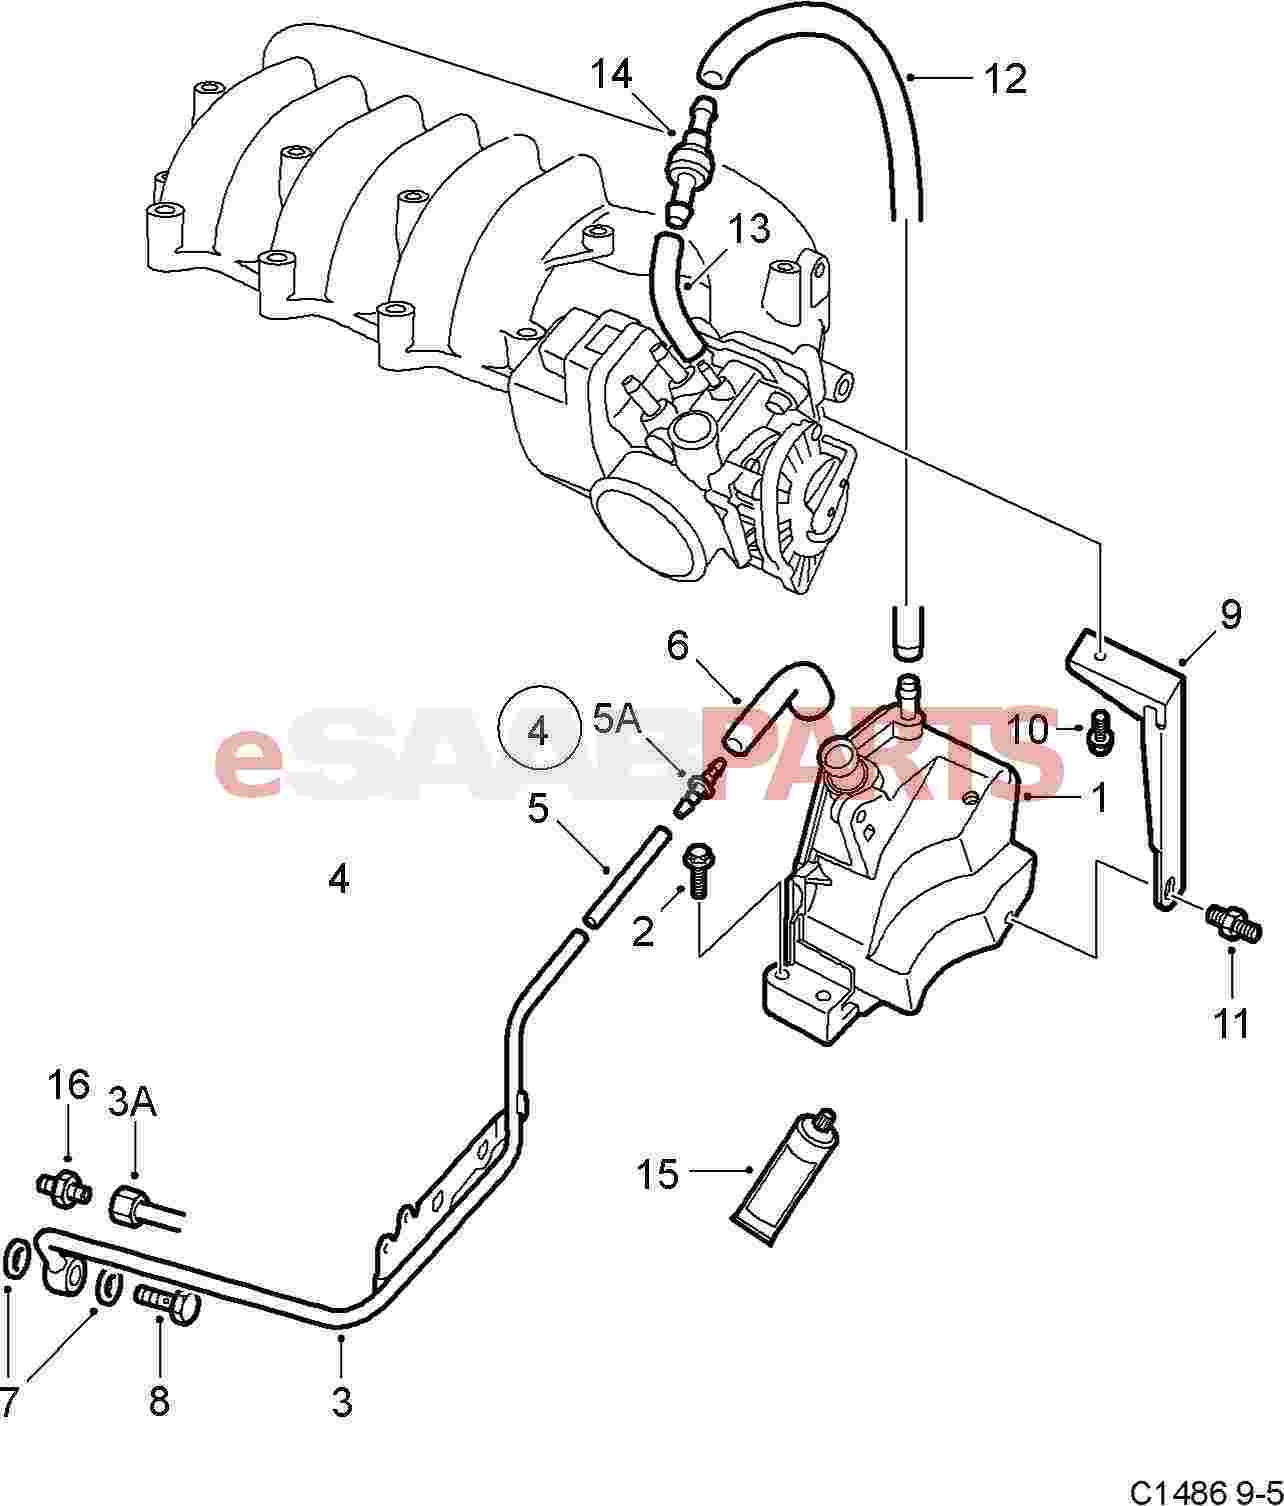 saab 900 se engine diagram wiring library VDO Gauge Wiring Diagram 1992 saab 900 turbo engine diagram 1992 saab 9000 turbo efi saab 9000 turbo engine diagram